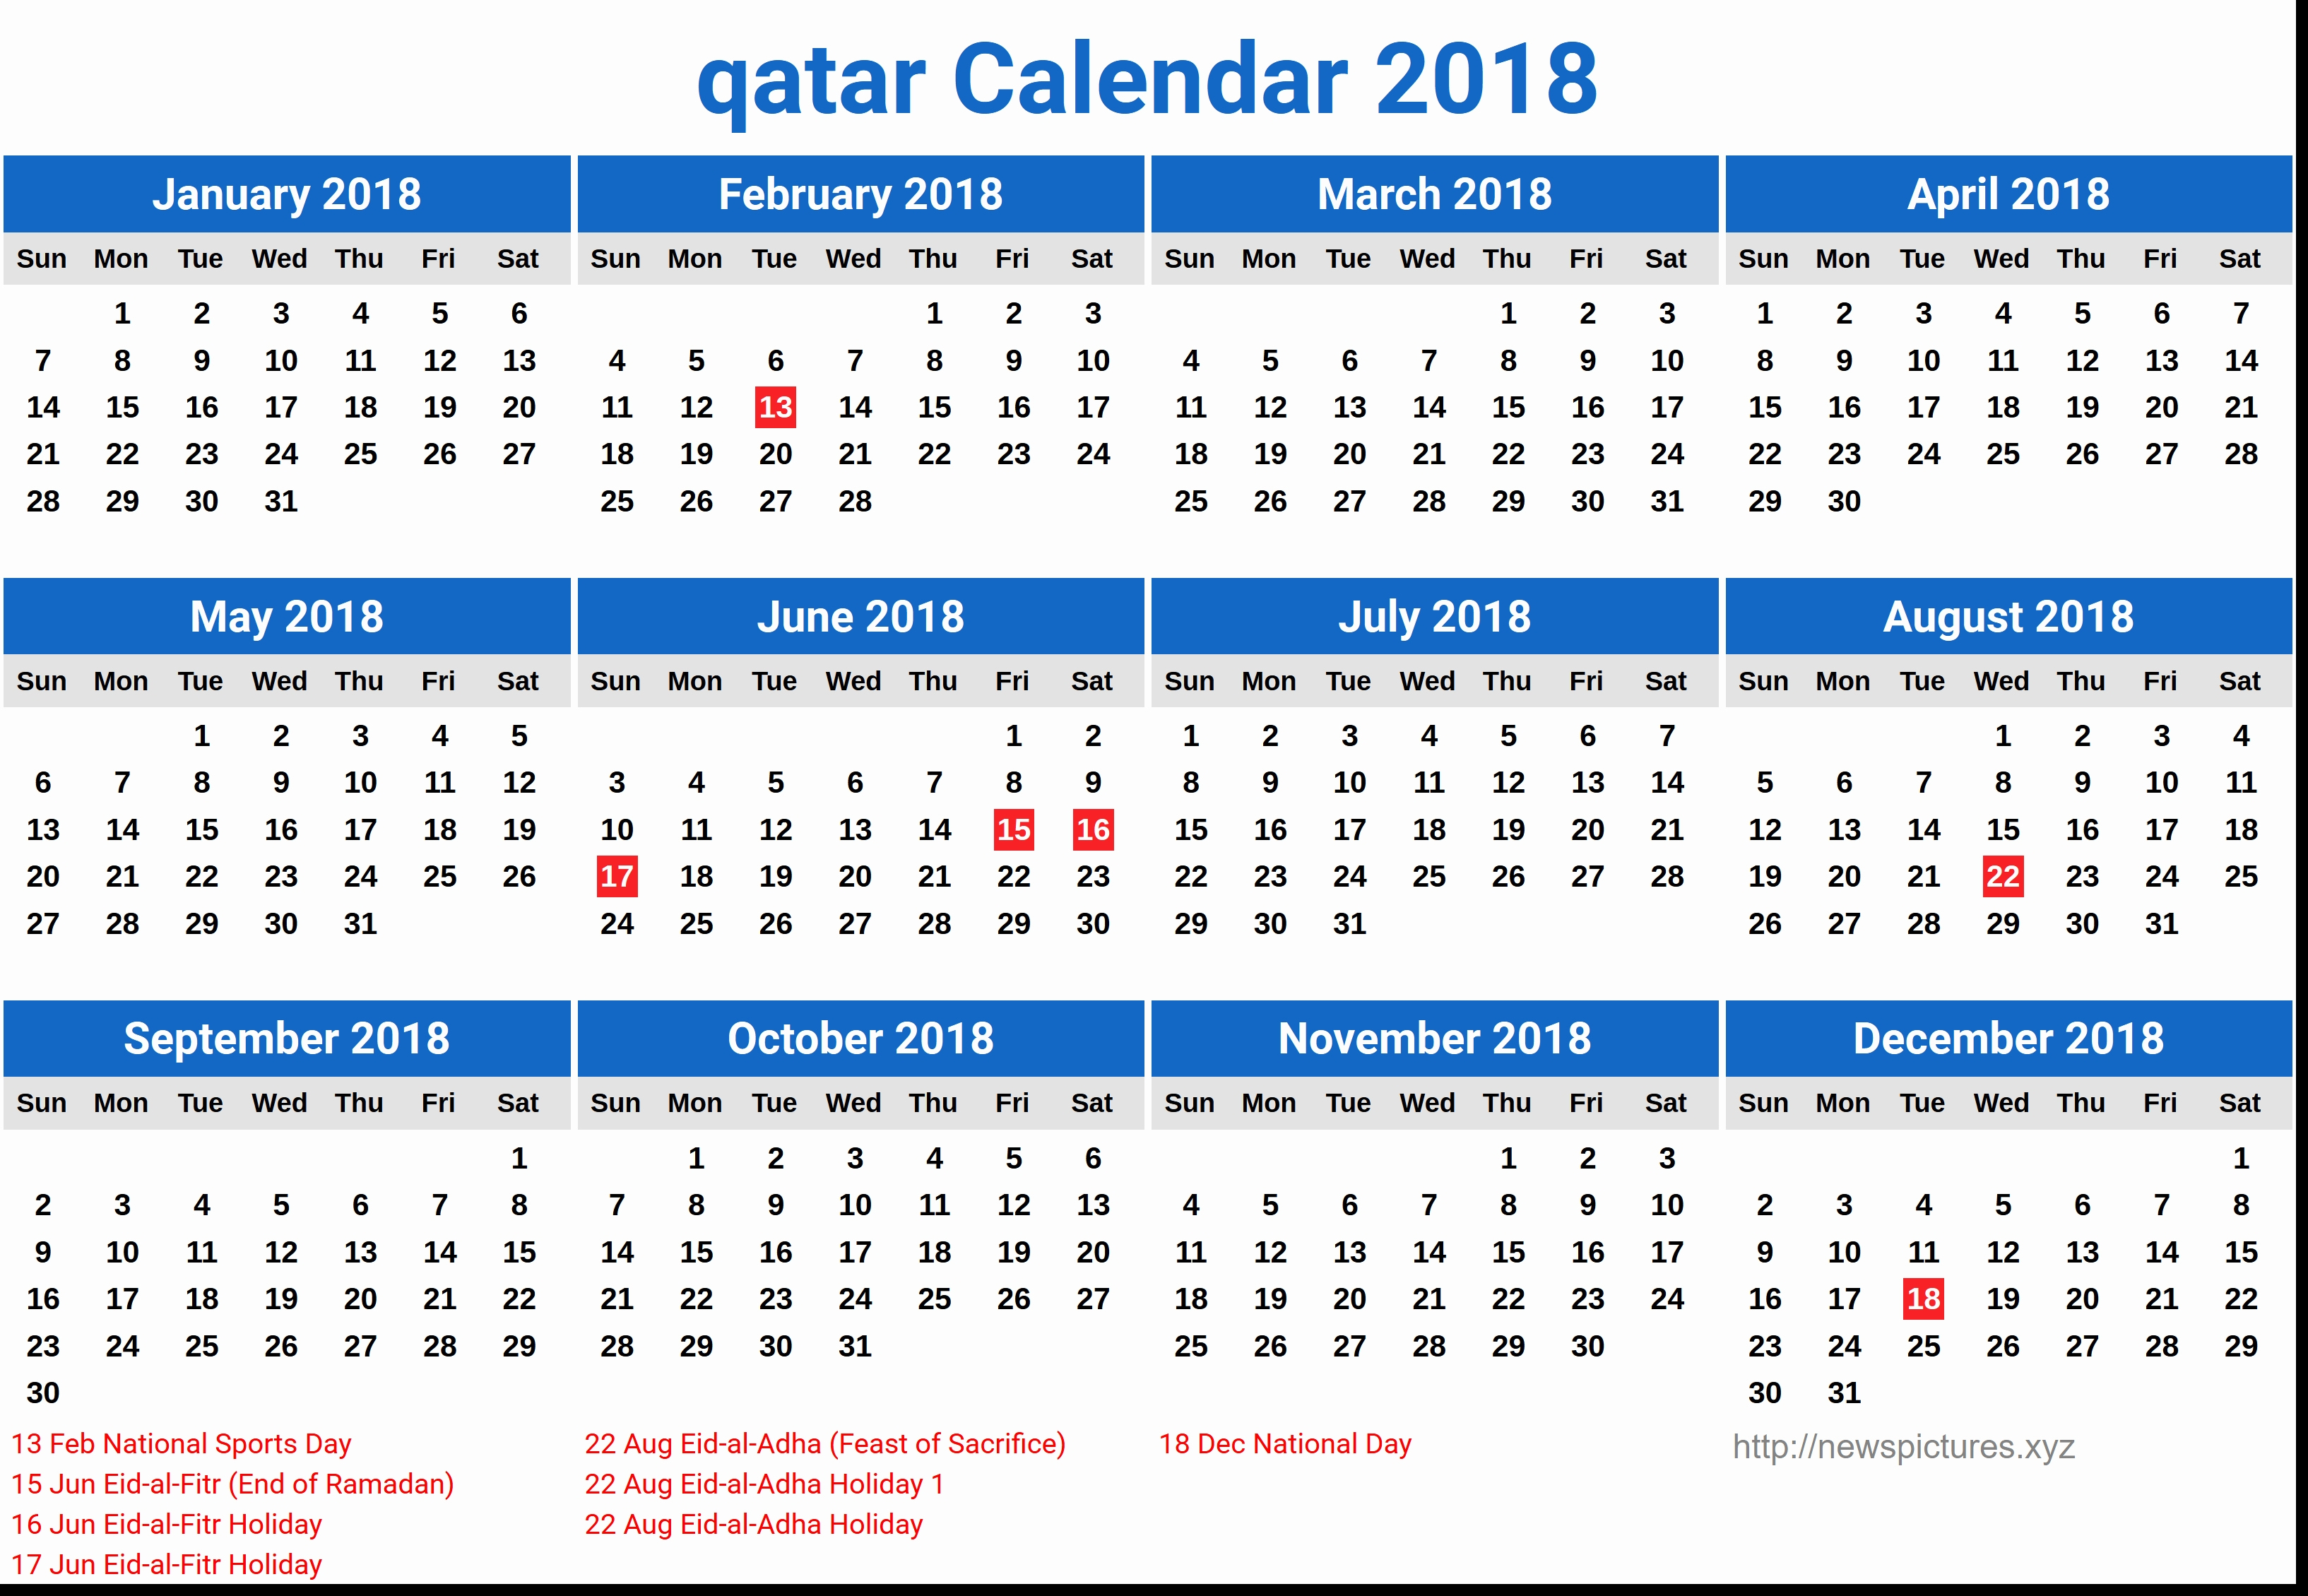 Qatar Calendar 2019 With Hong Kong Free 2018 Printable | Seimado Calendar 2019 Hong Kong